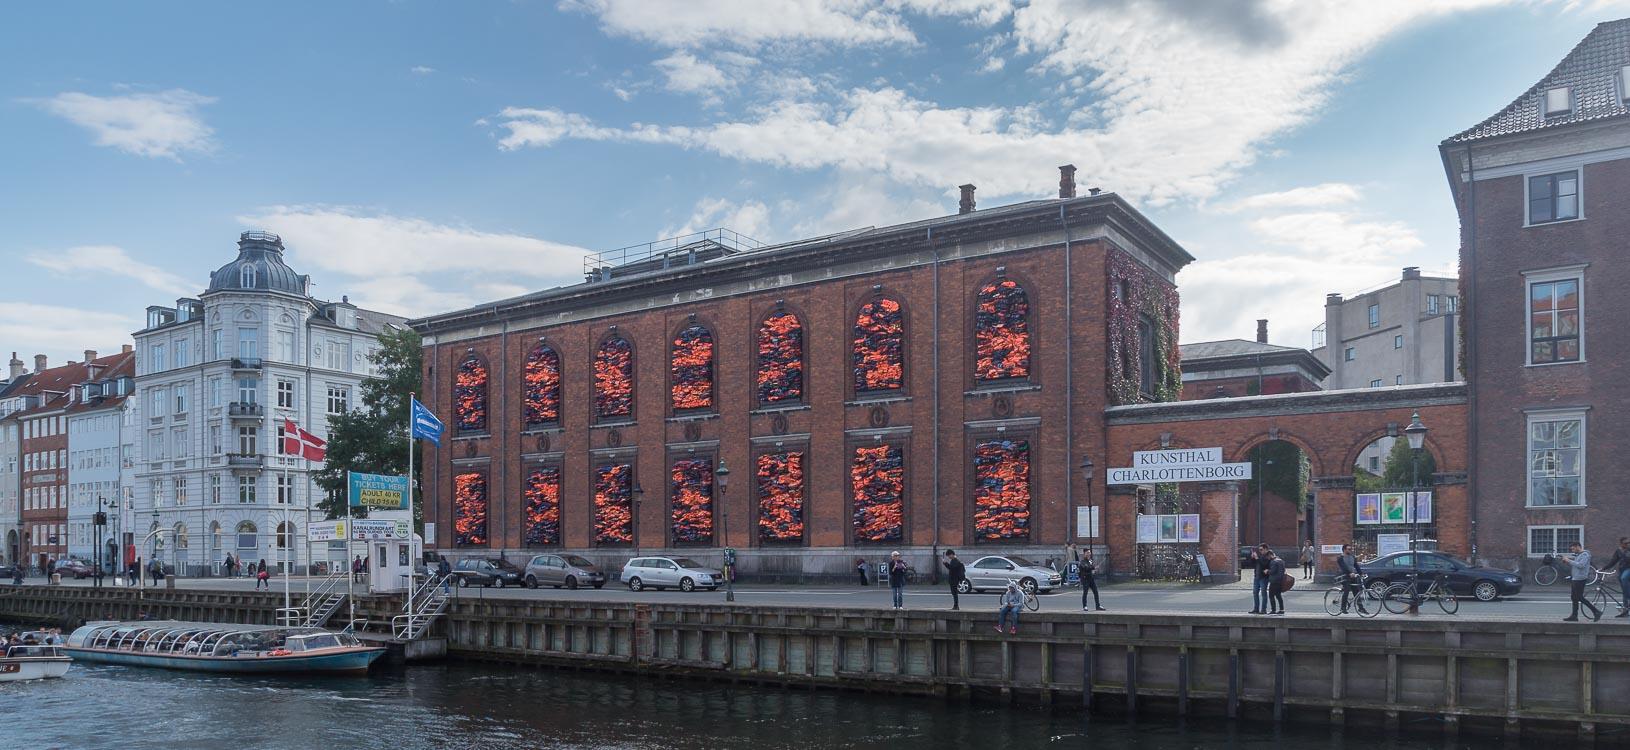 Kunsthalle Charlottenborg